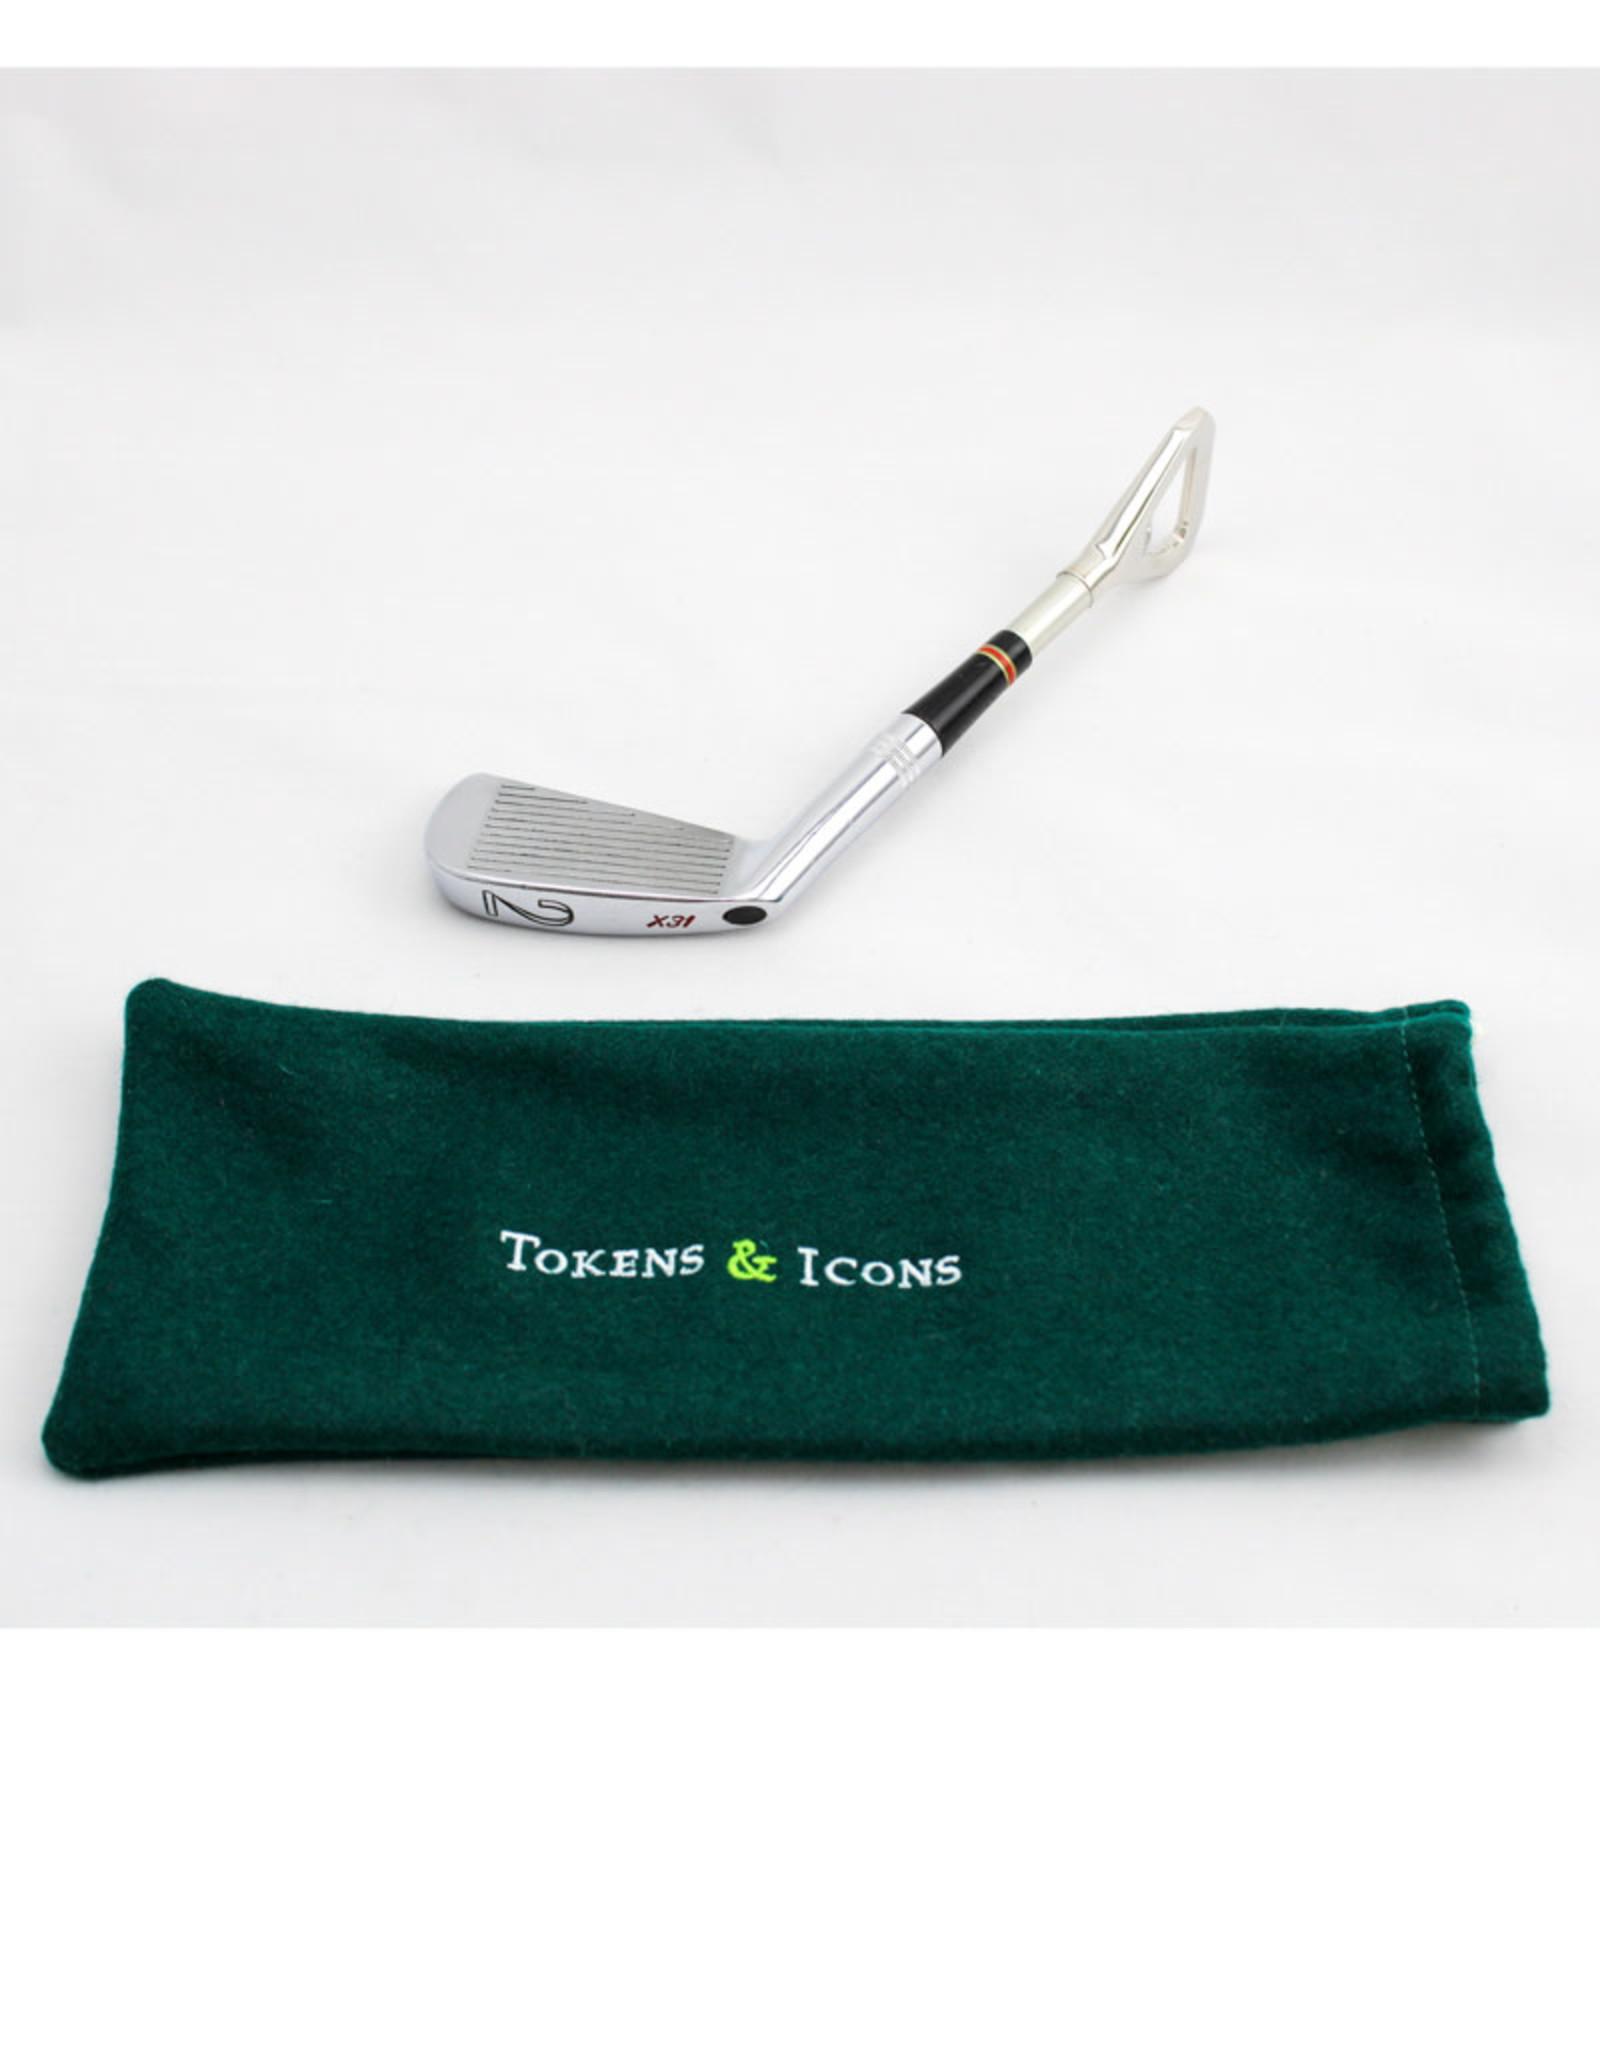 Tokens & Icons Golf Iron Bottle Opener